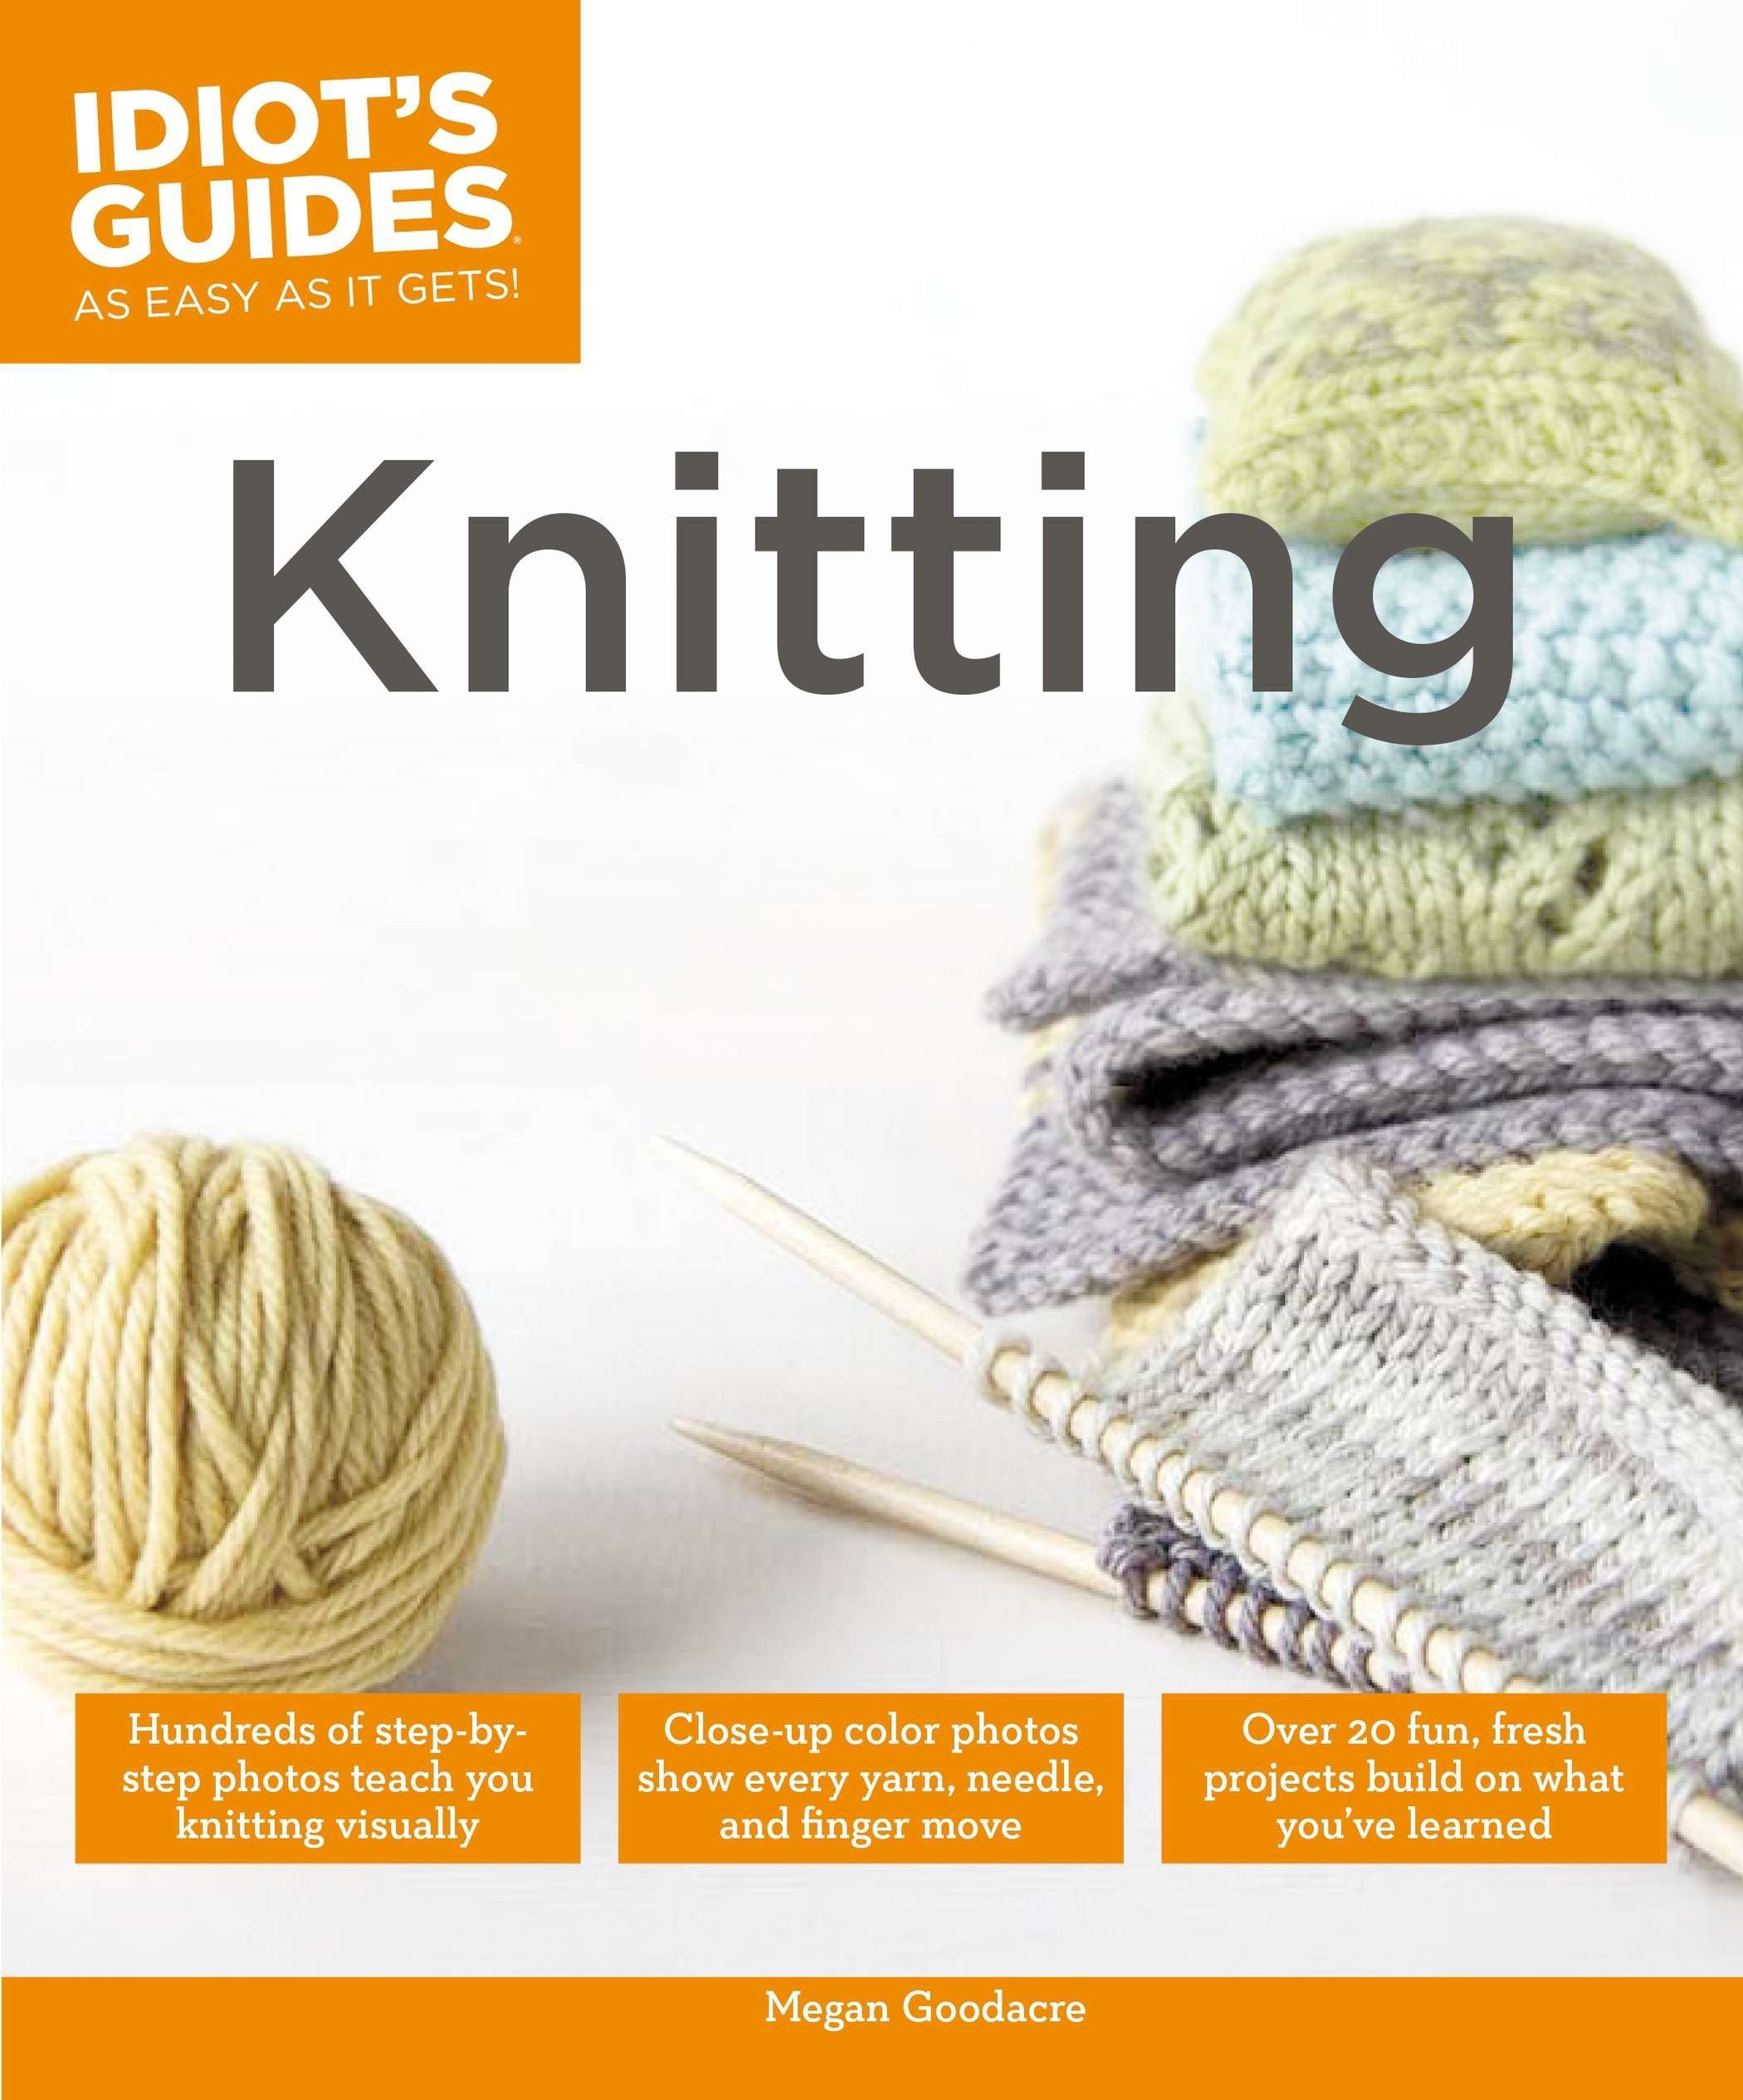 Knitting Idiots Guides Megan Goodacre product image